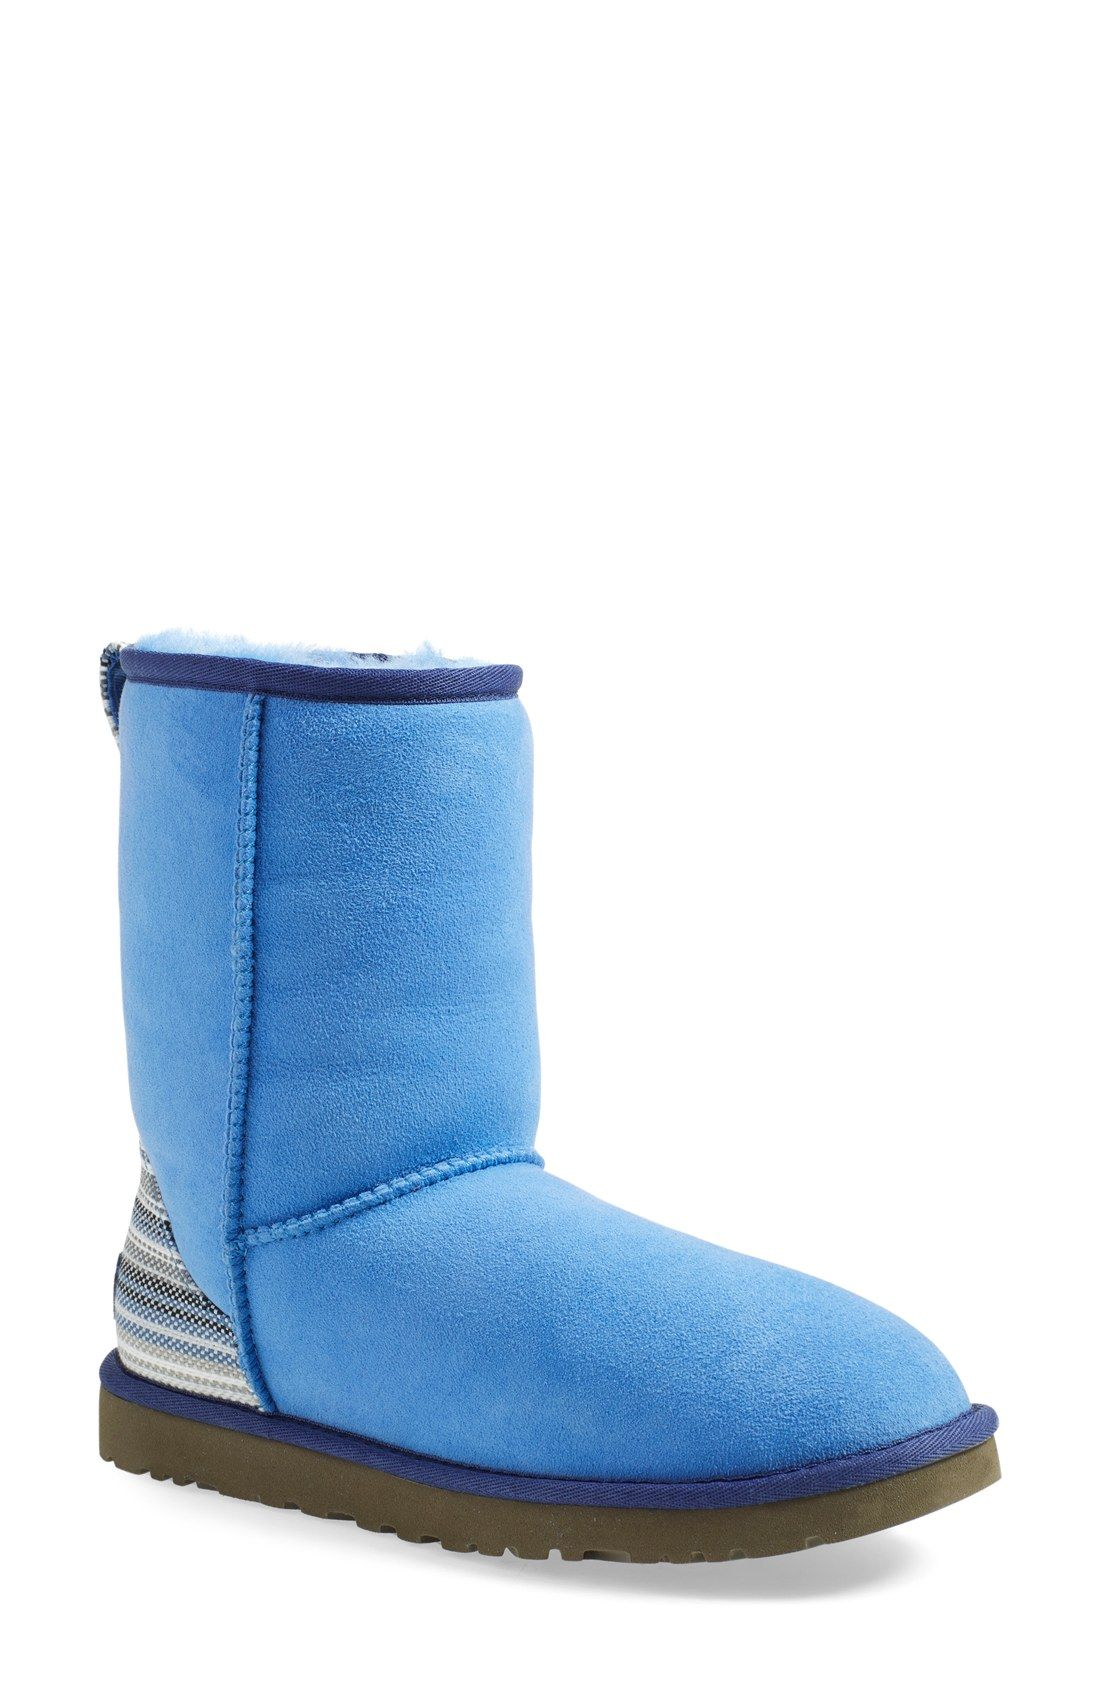 UGG® 'Classic Short - Serape' Water Resistant Boot (Women) | Nordstrom